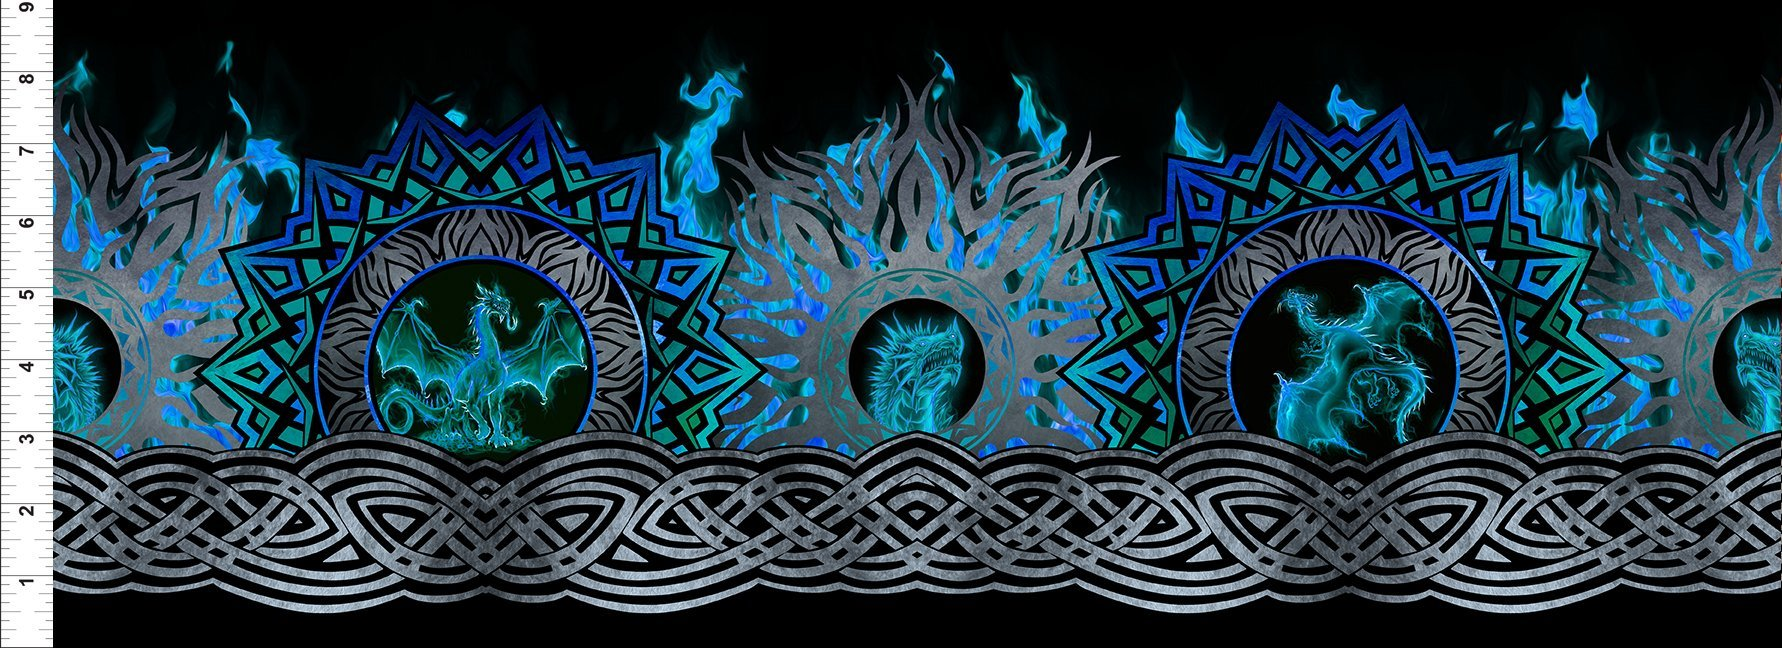 In the Beginning, Dragon - Blue Fury - Flame Border Black/Blue